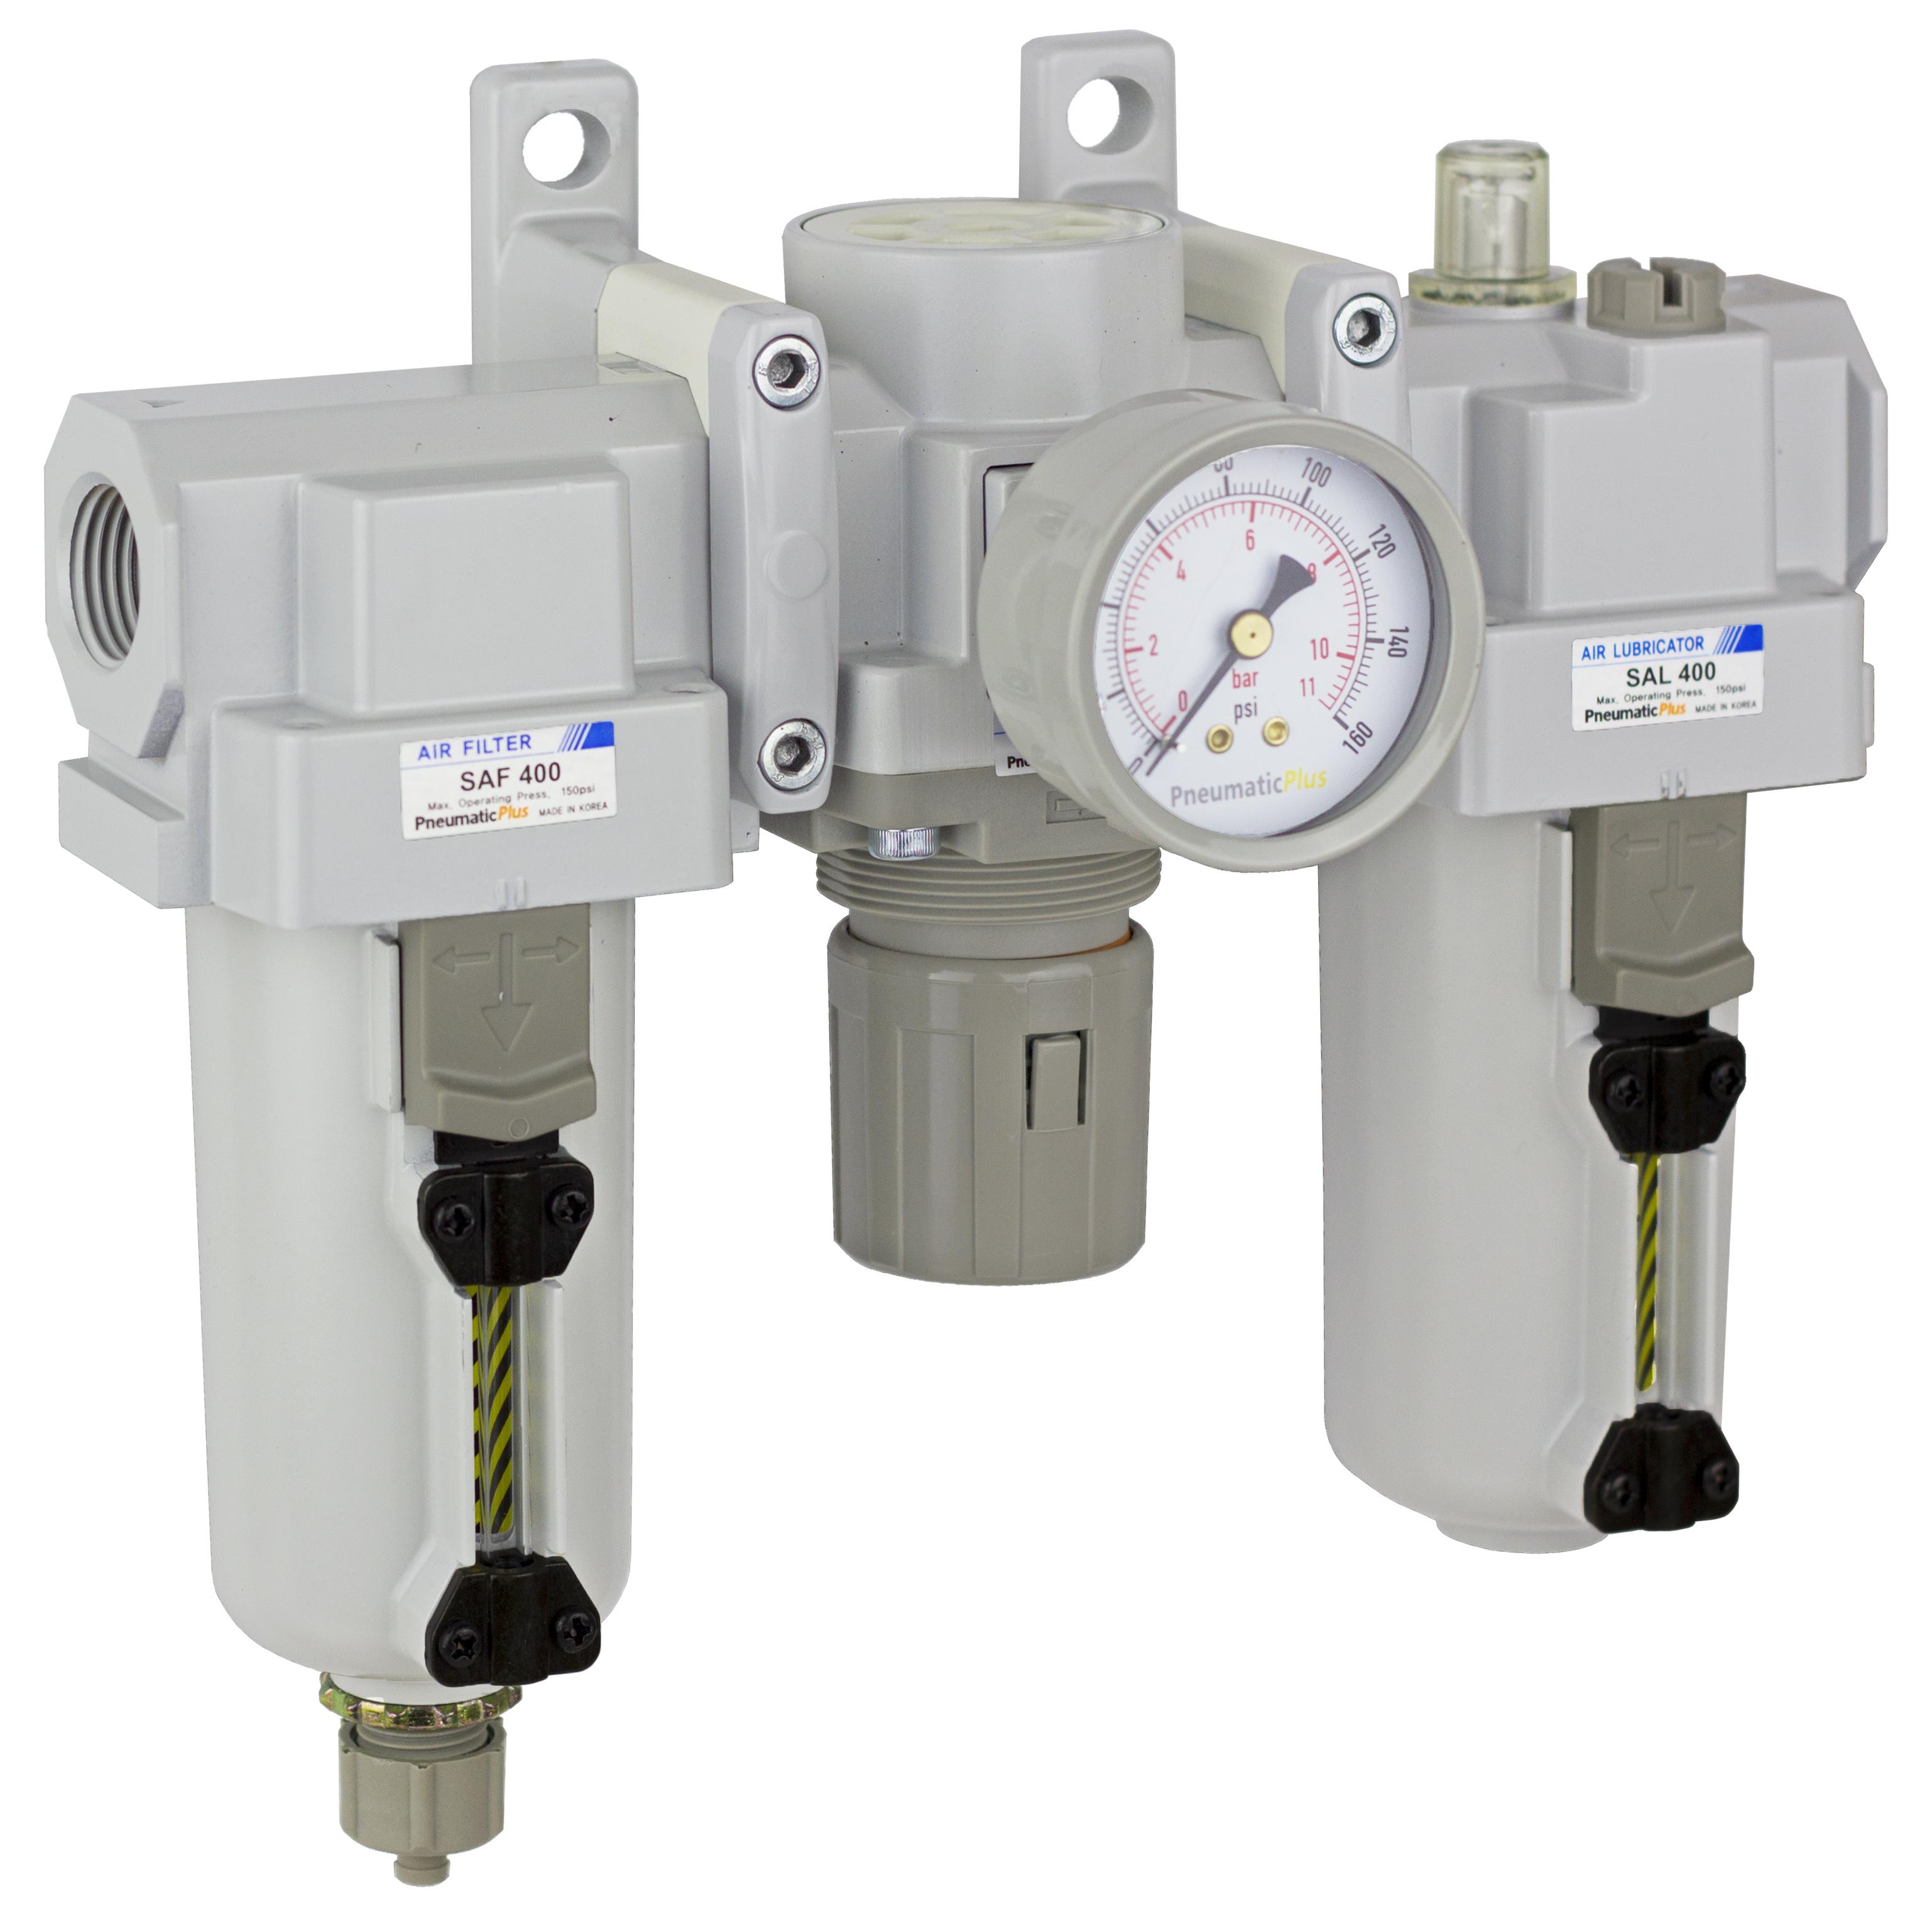 "PneumaticPlus SAU400-N04G-MEP Compressed Air Filter Regulator Lubricator Combo 1/2"" NPT - Metal Bowl, Manual Drain, Bracket, Gauge"